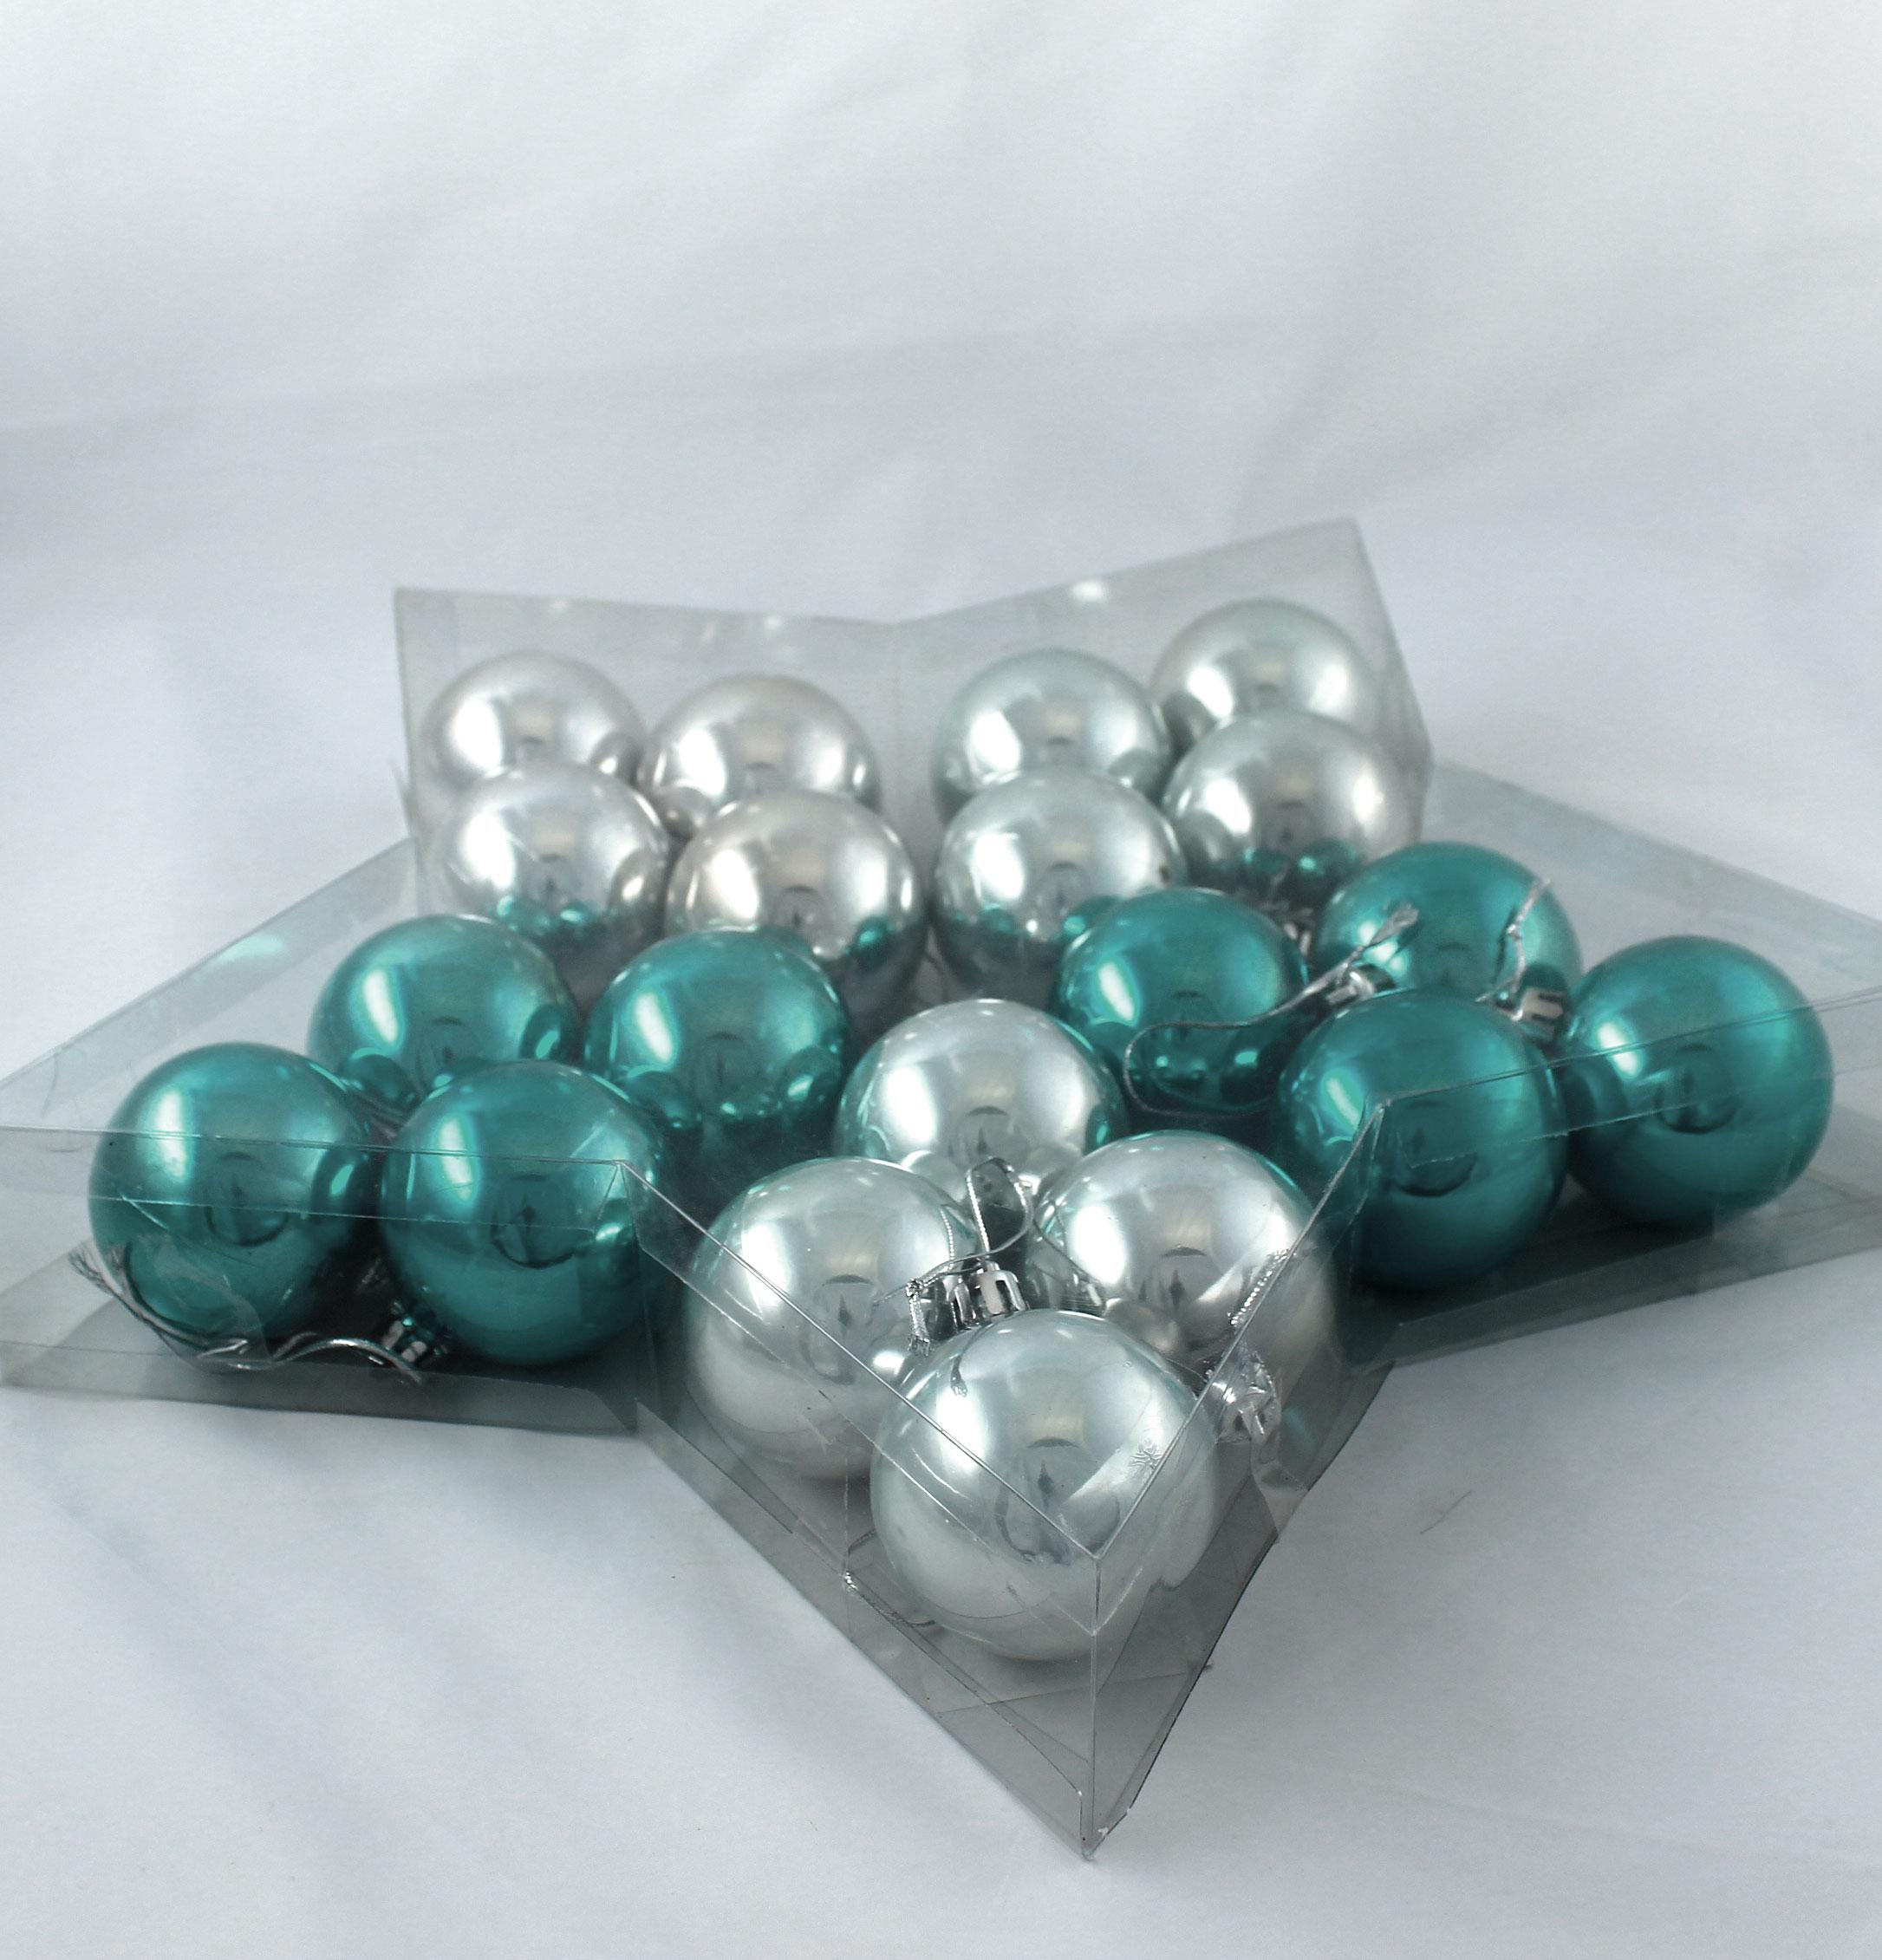 weihnachtskugel plastik 5cm winterhimmel 20st preiswert. Black Bedroom Furniture Sets. Home Design Ideas